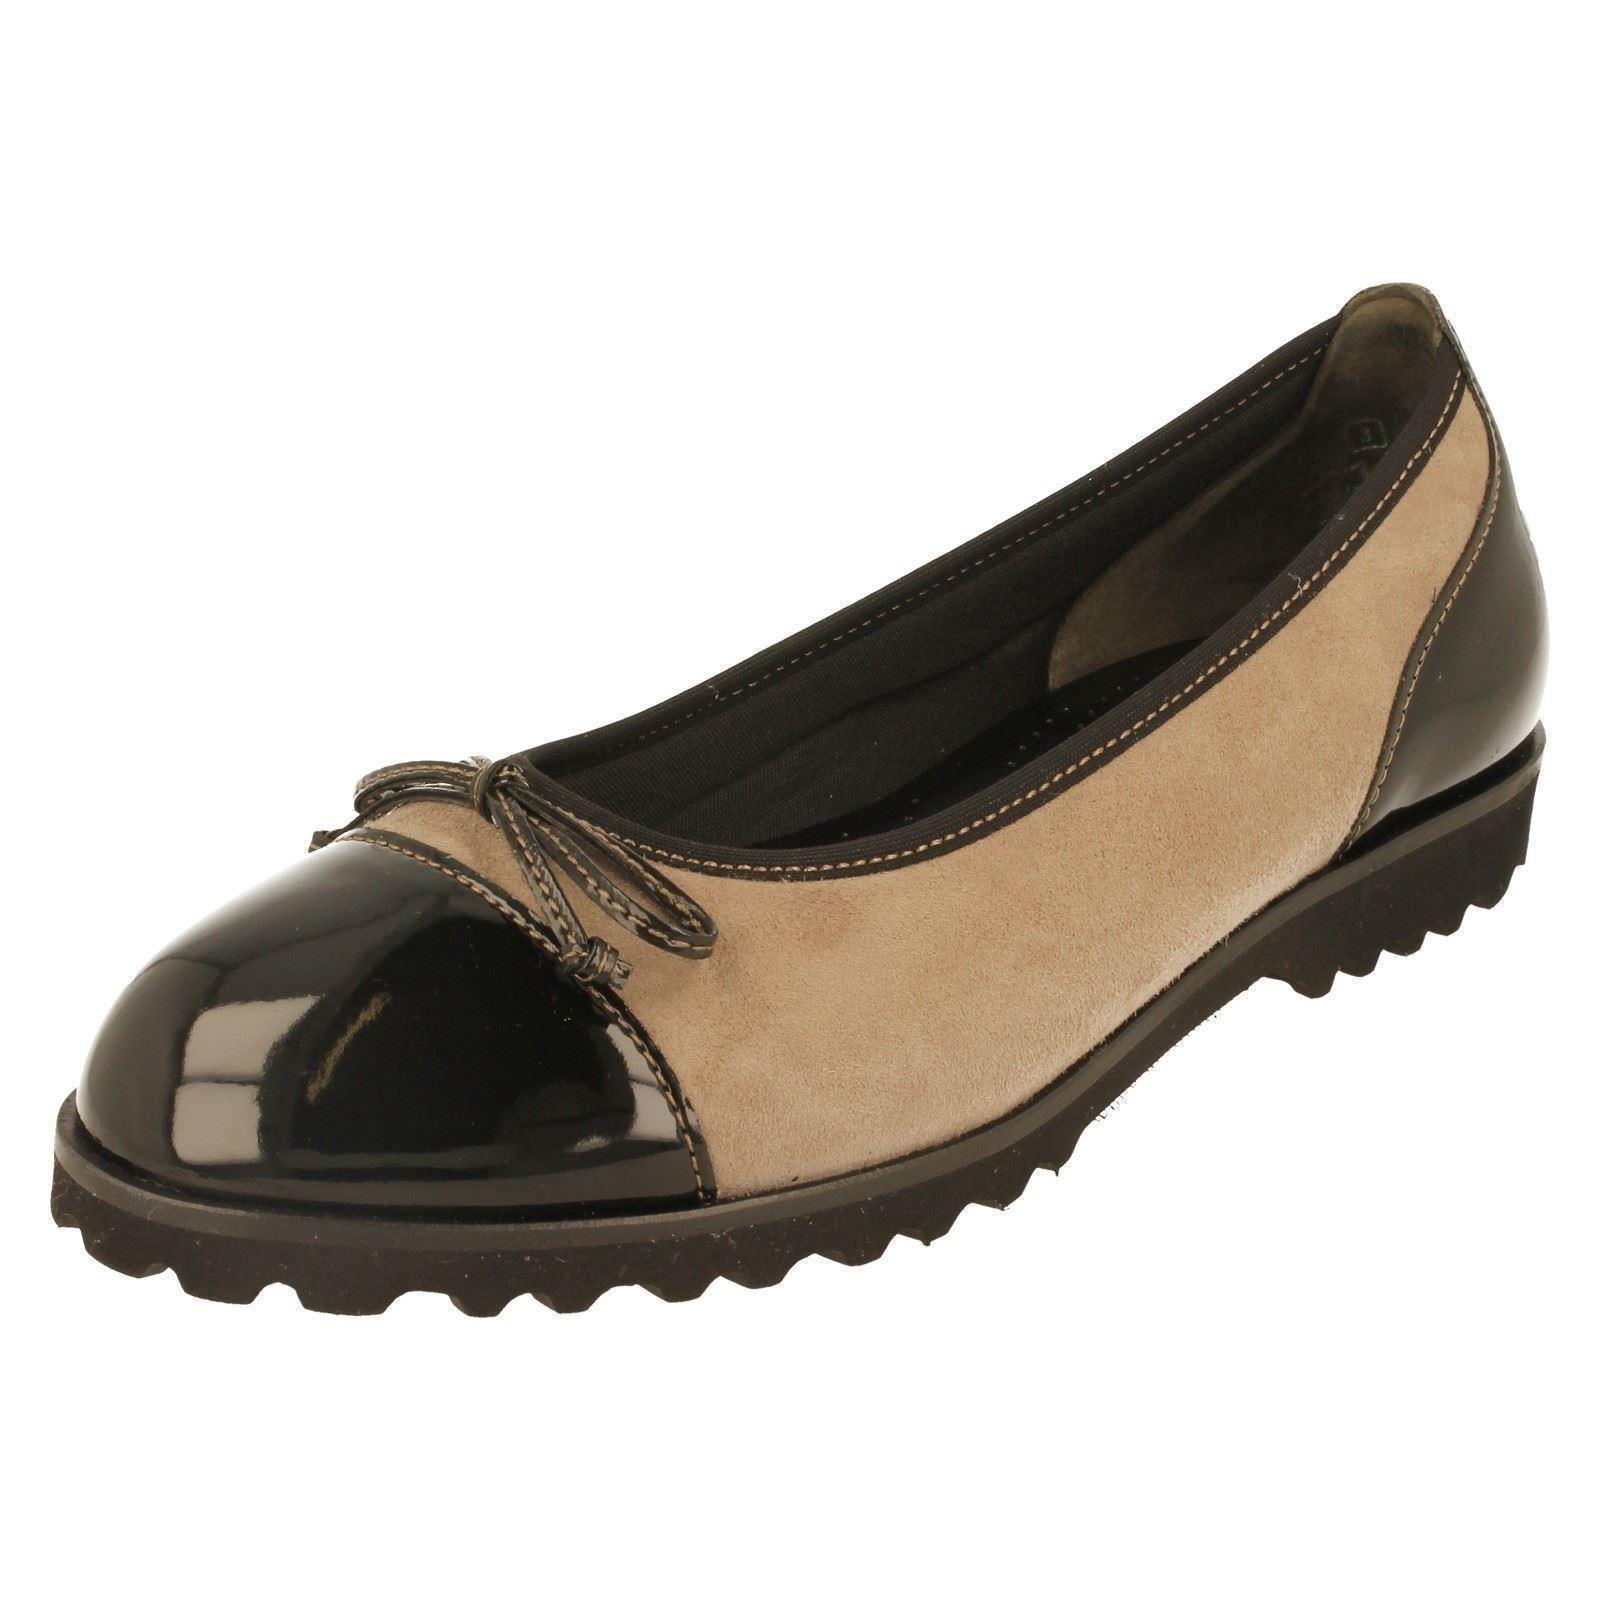 Messieurs / Dames Femmes gabor chaussures style 53100-W Le consommateur consommateur consommateur d'abord Mode attrayante Liste des explosions 9a1ec8